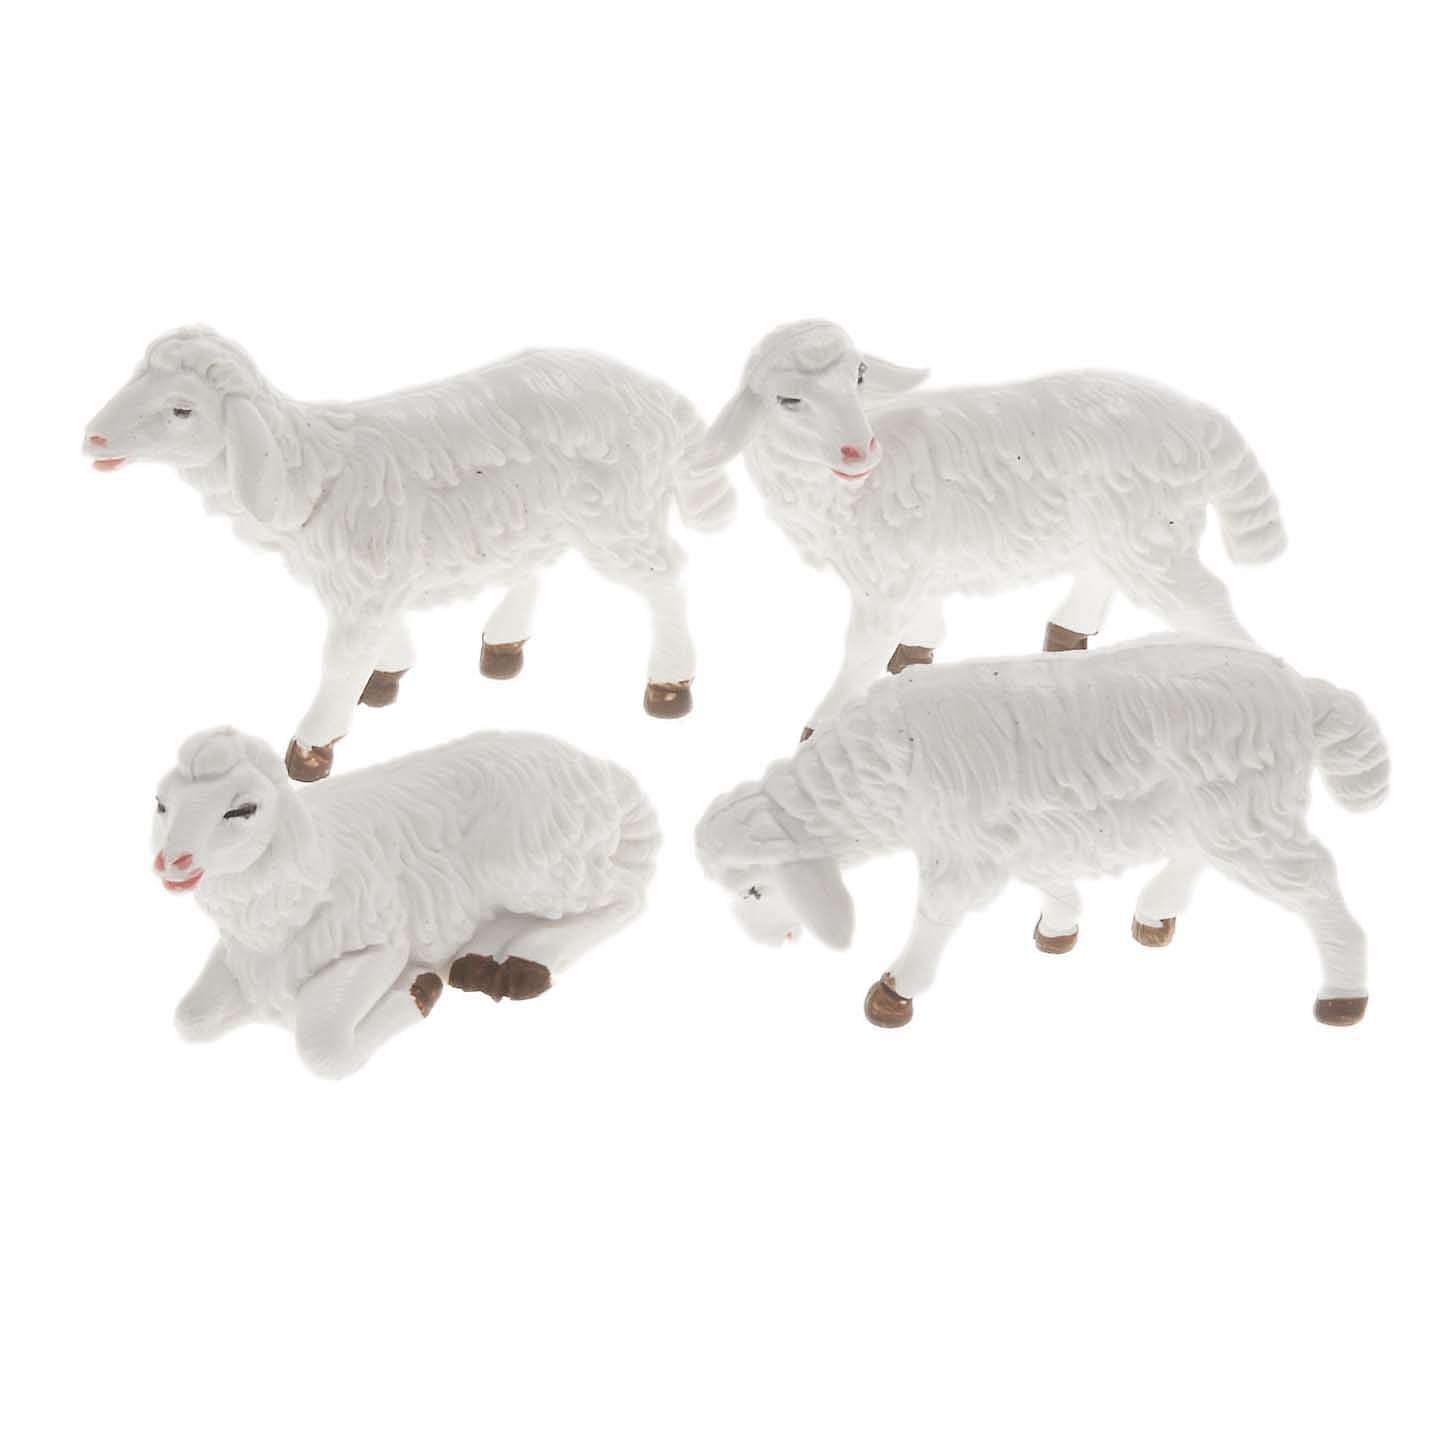 Nativity scene figurines, white plastic sheep, 4 pieces 12cm 3